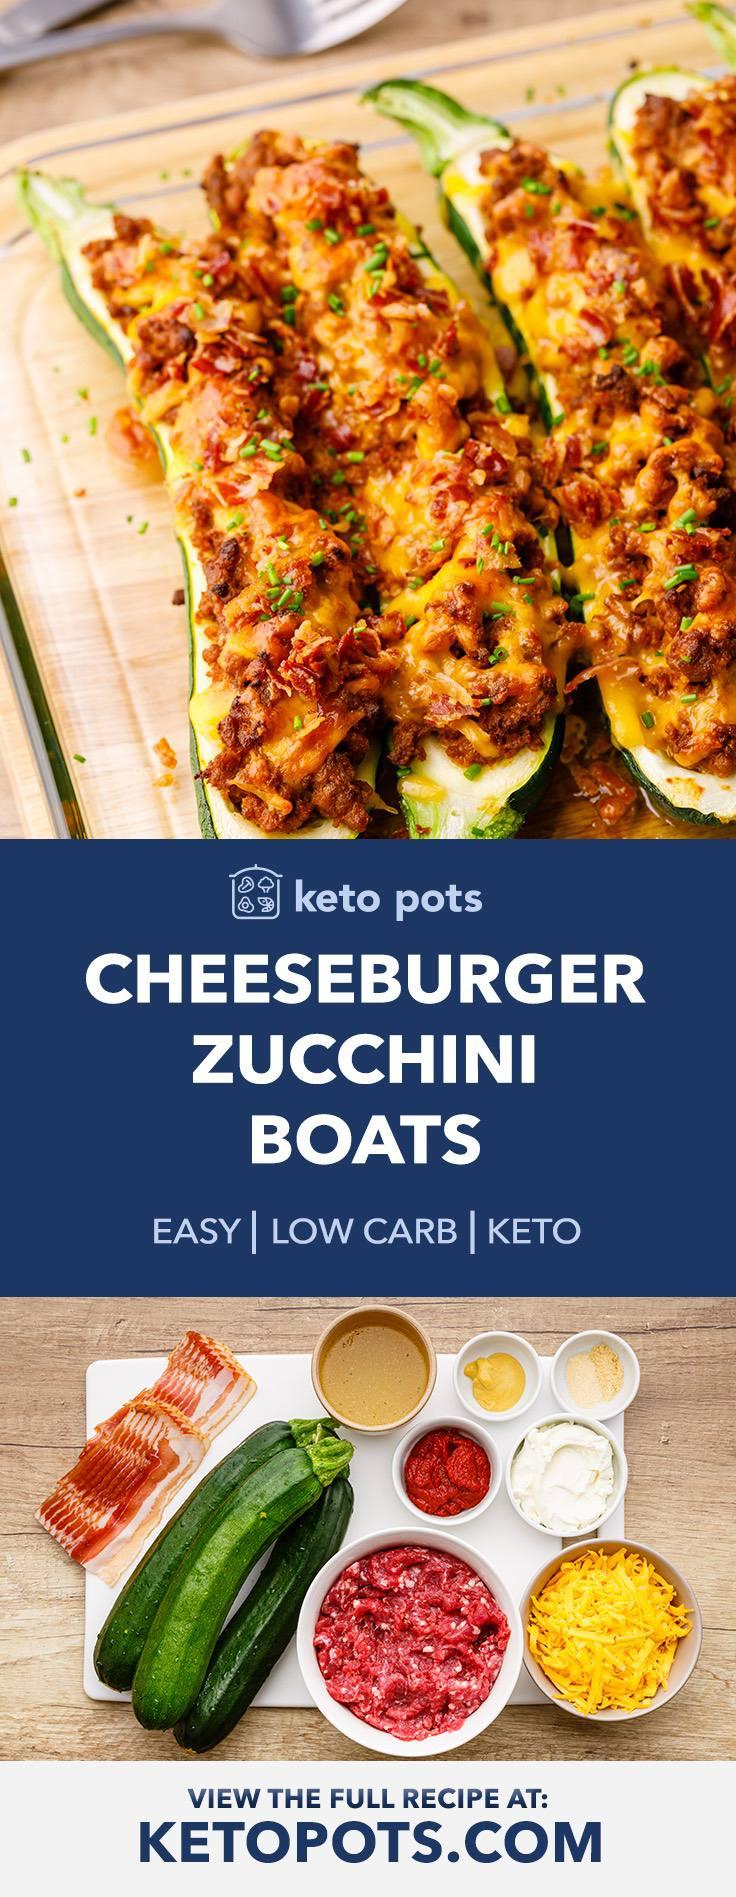 Easy Keto Bacon Cheeseburger Zucchini Boats